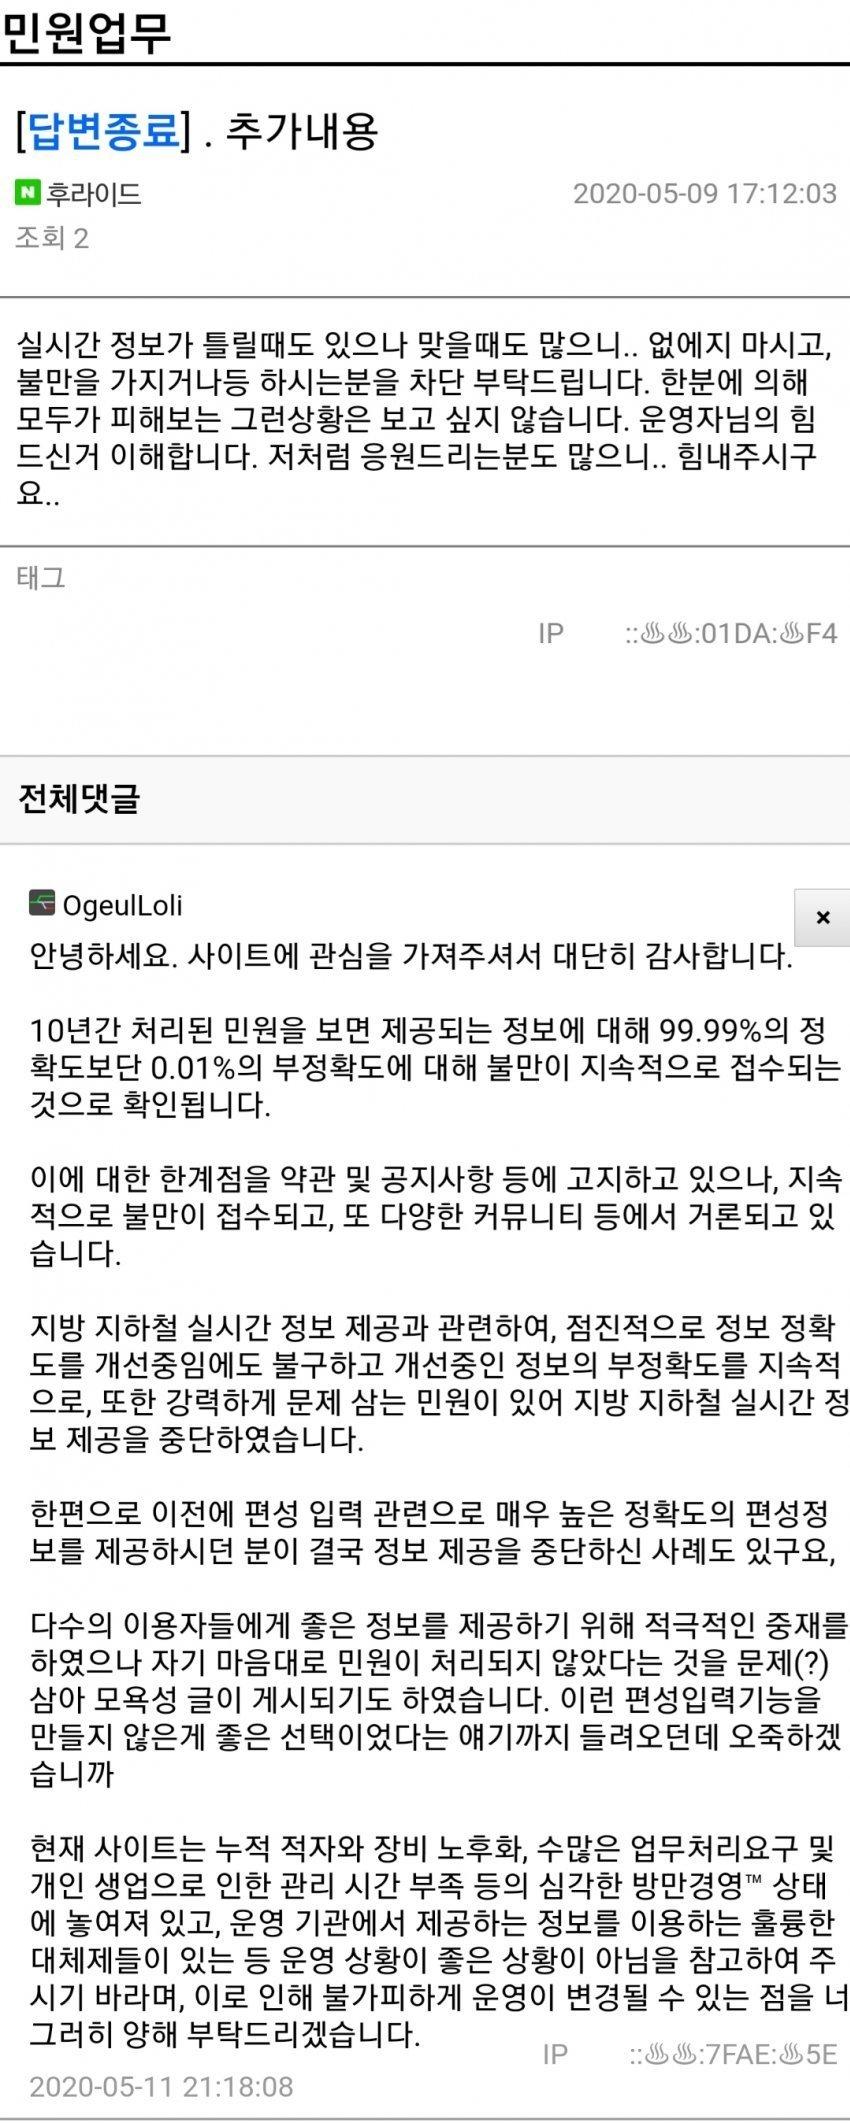 viewimage.php?id=20b2de29f7d331aa&no=24b0d769e1d32ca73dec87fa11d0283123a3619b5f9530e1a1306968e3deca13c514b1240bc8fe443f933e1db6a0b24a24eea330293cba11ec2d4abcb5baebcd18a39405d83bce1580e11fe8aaff4ea7a35ba7